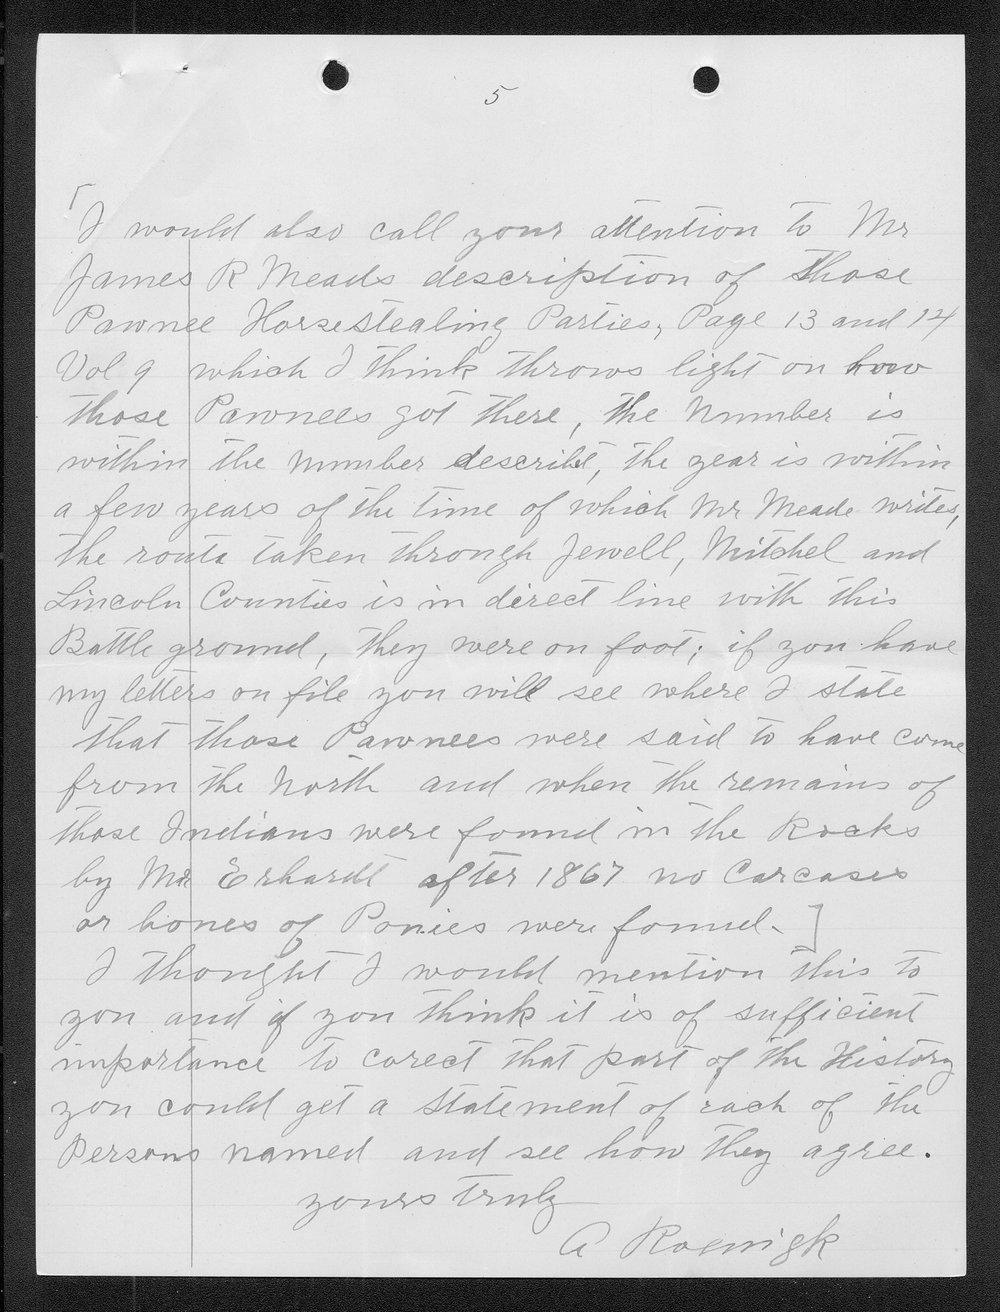 Adolph Roenigk and George W. Martin correspondence - 12